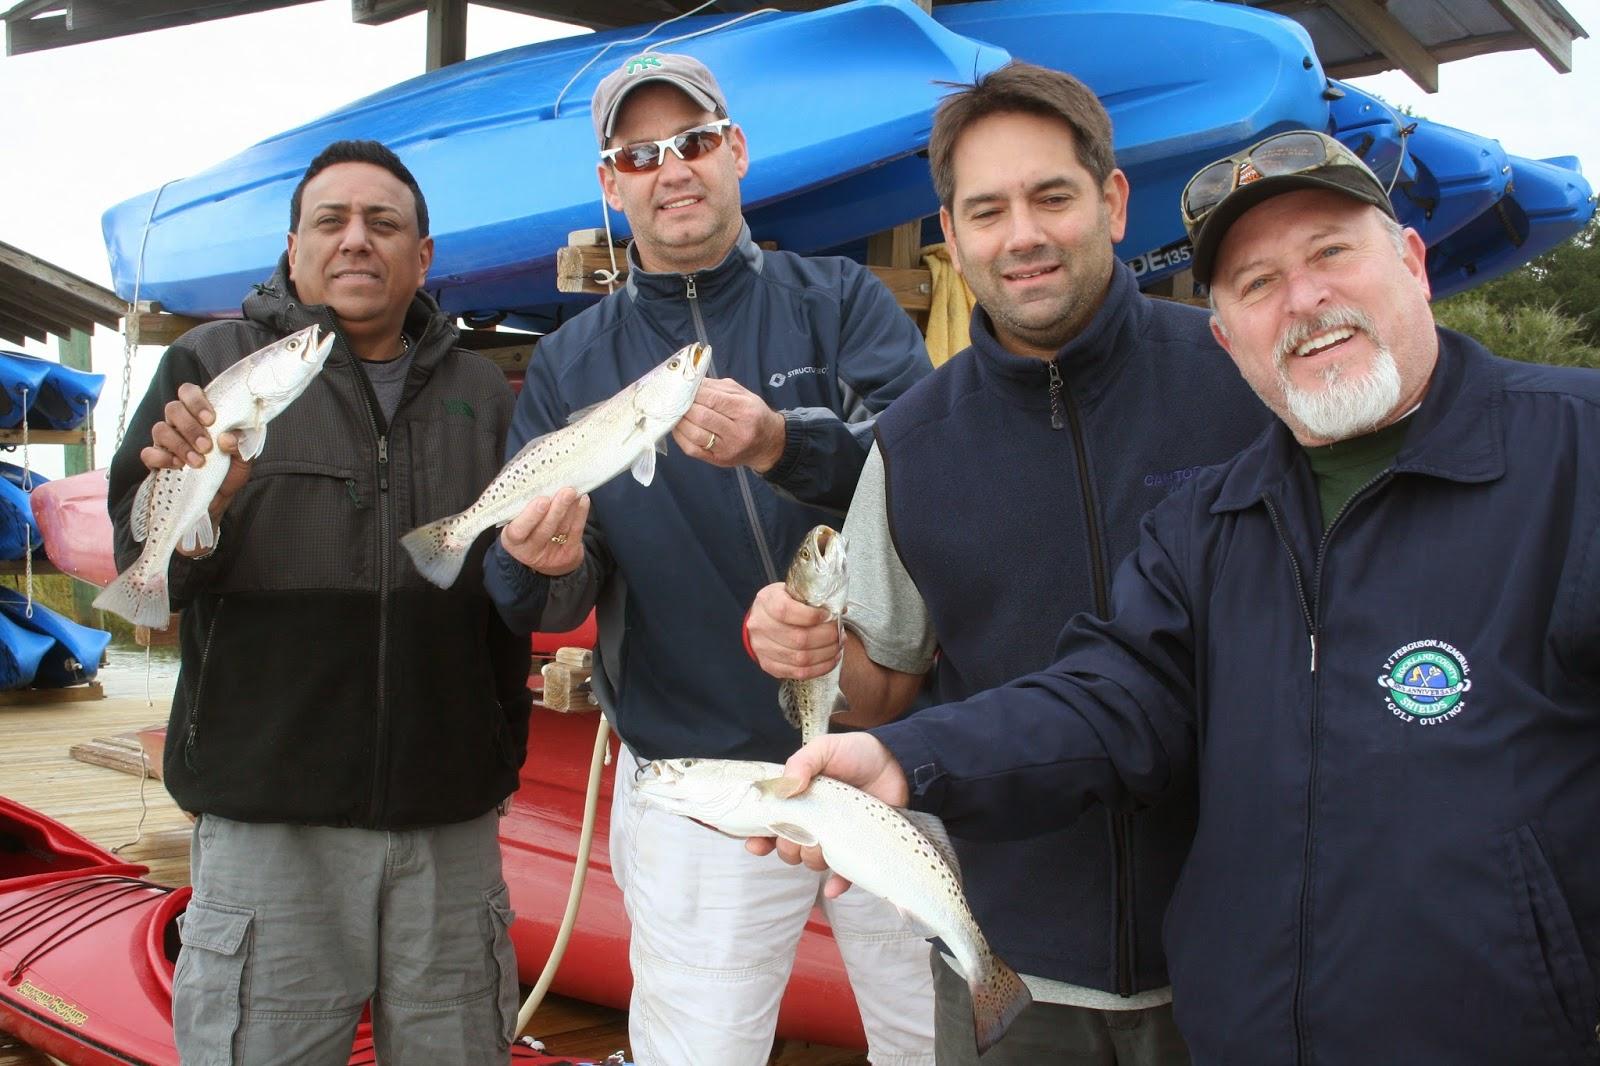 Affinity charters kiawah island fishing charter for Kiawah island fishing